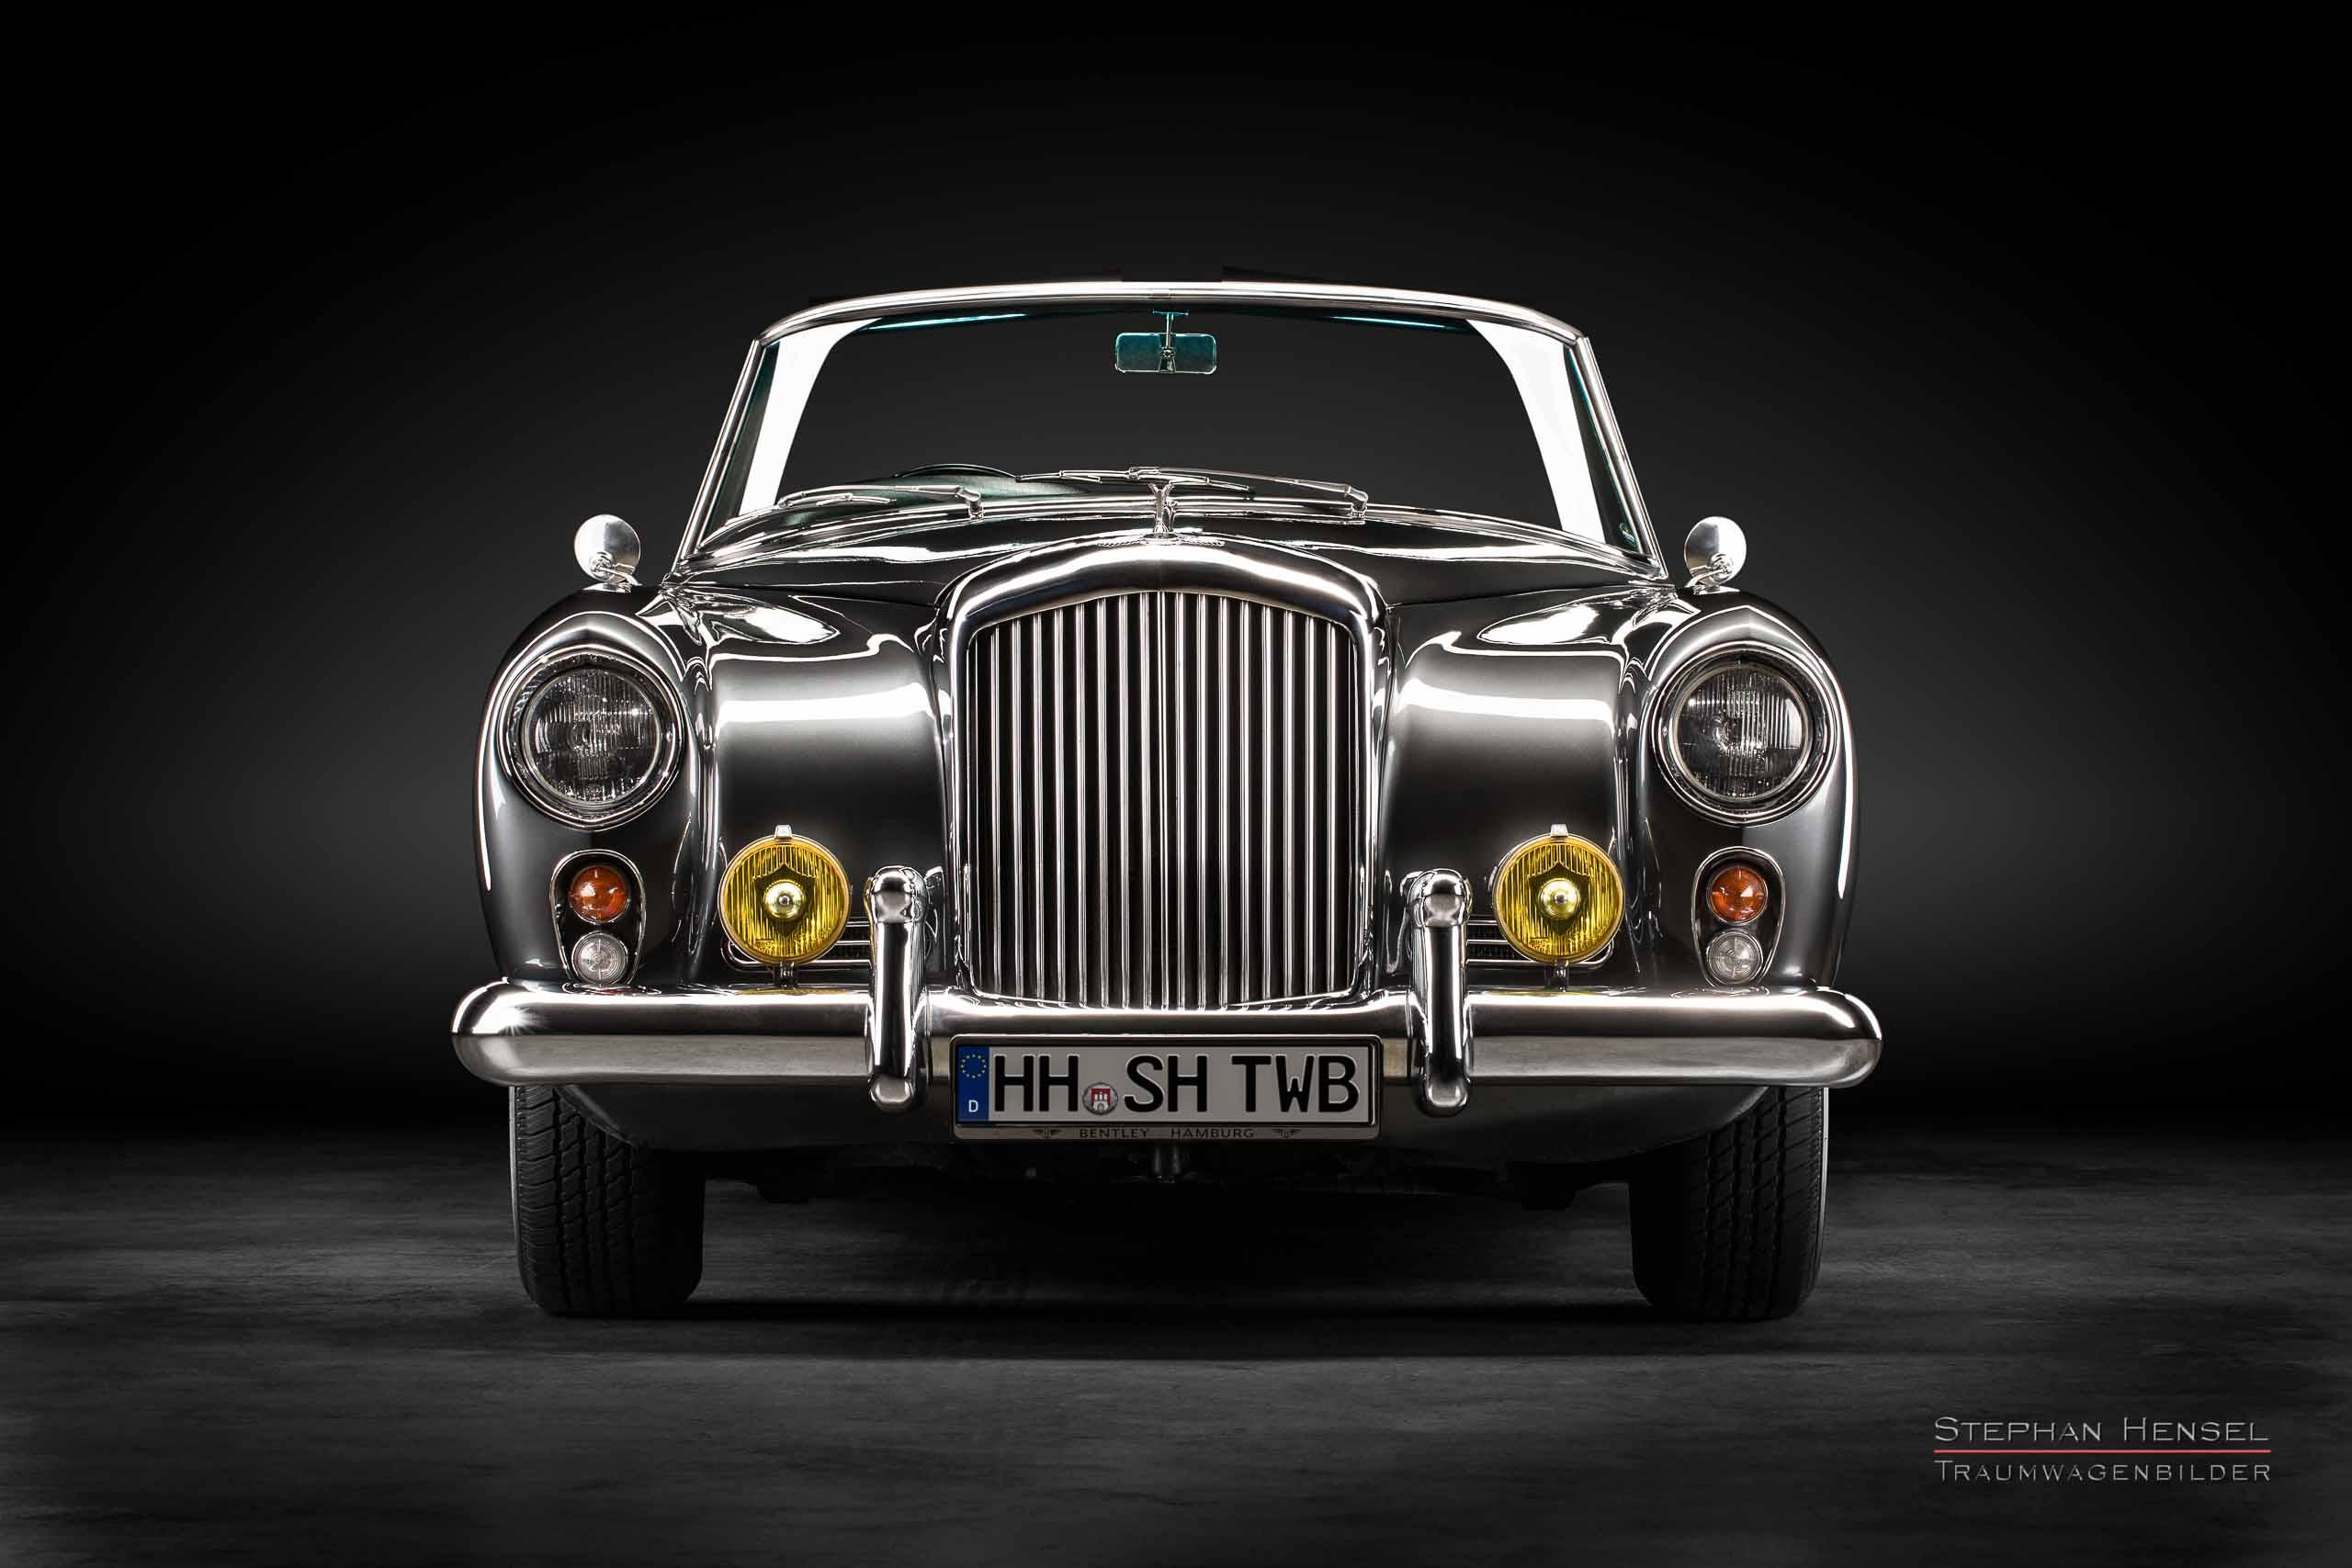 Bentley S2 Continental DHC, 1960, Frontalansicht, Autofotograf, Hamburg, Automobilfotograf, Oldtimerfotograf, Oldtimerfotografie, Car Photography, Stephan Hensel